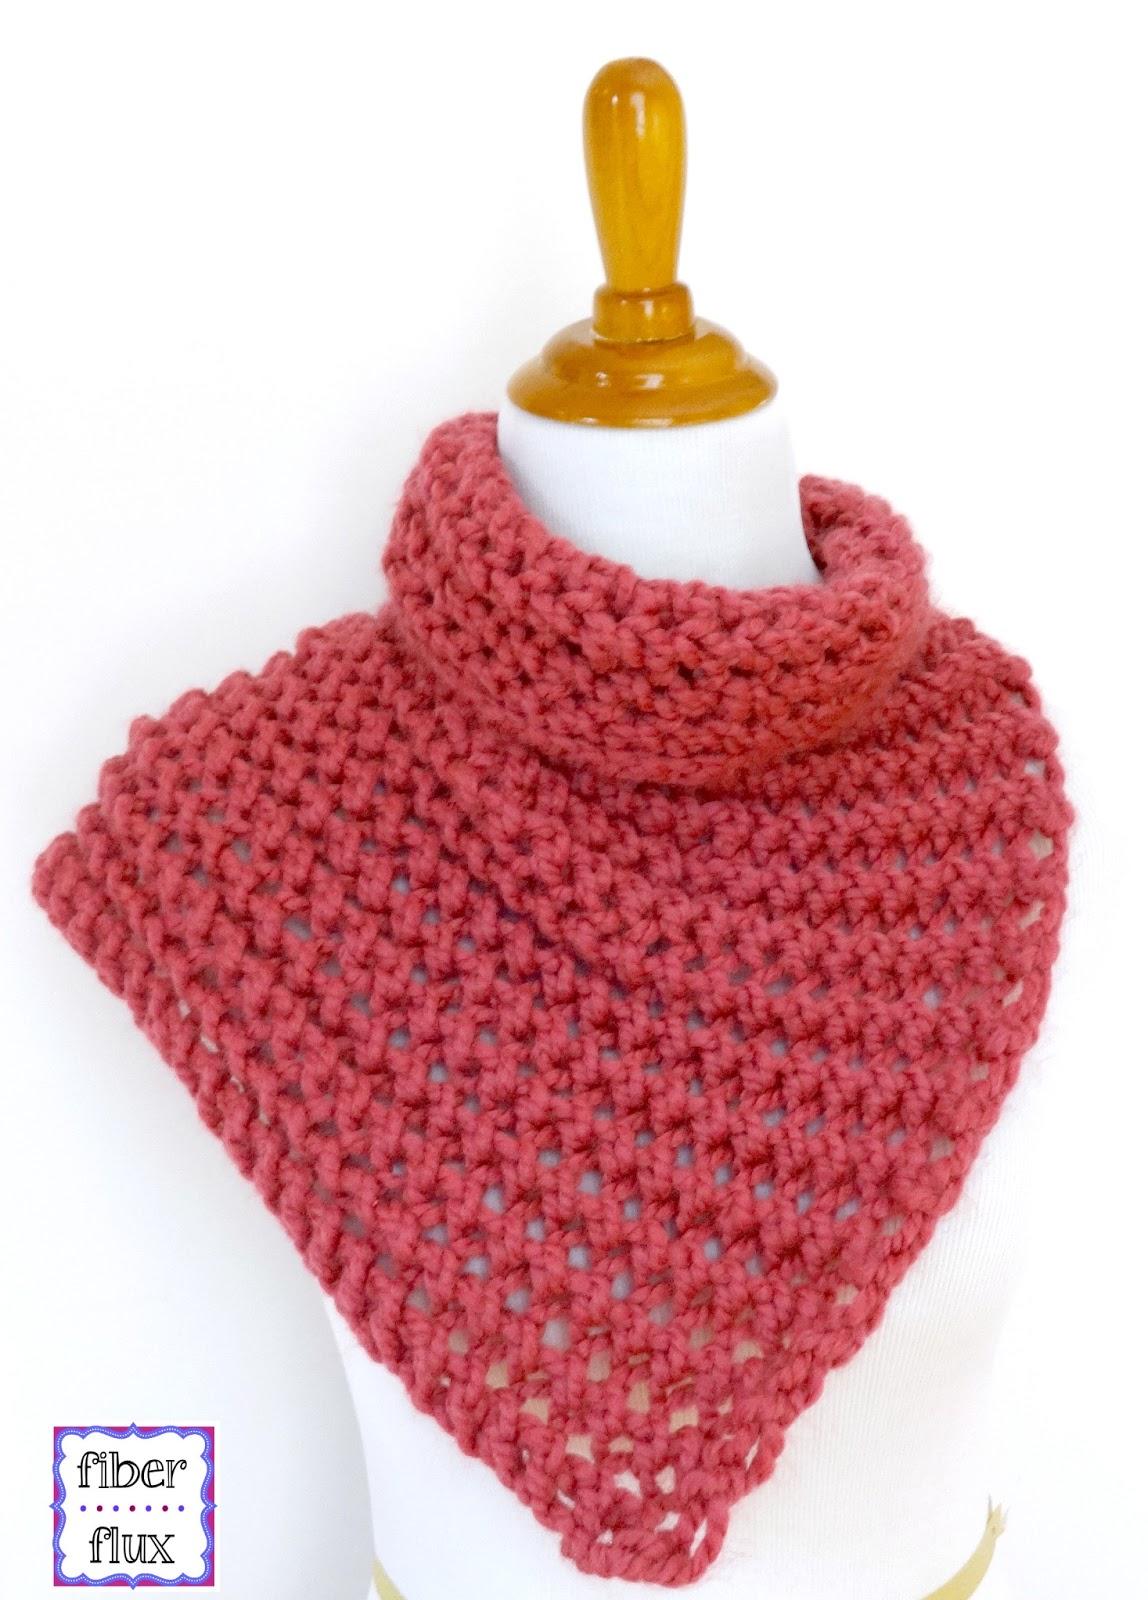 Fiber flux free knitting patterns free knitting patterns tweedy eyelet scarf raspberry sorbet button cowl dt1010fo